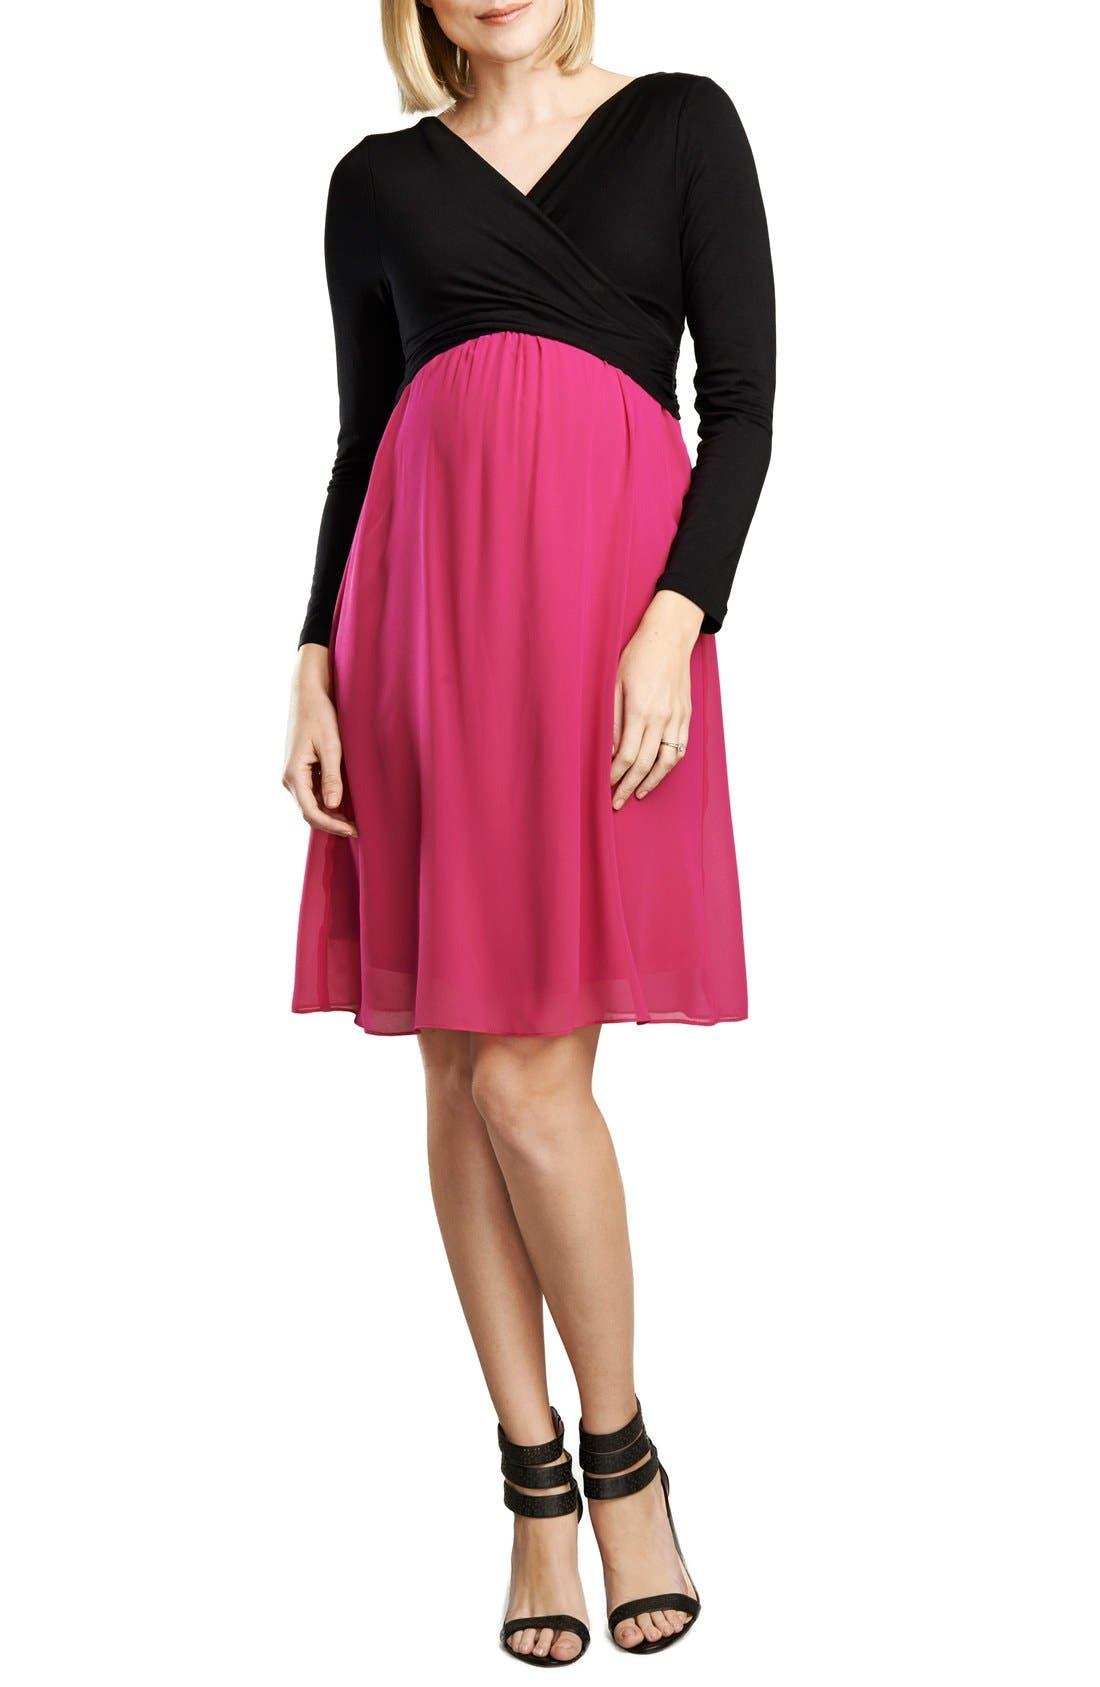 MATERNAL AMERICA Crossover Maternity Dress